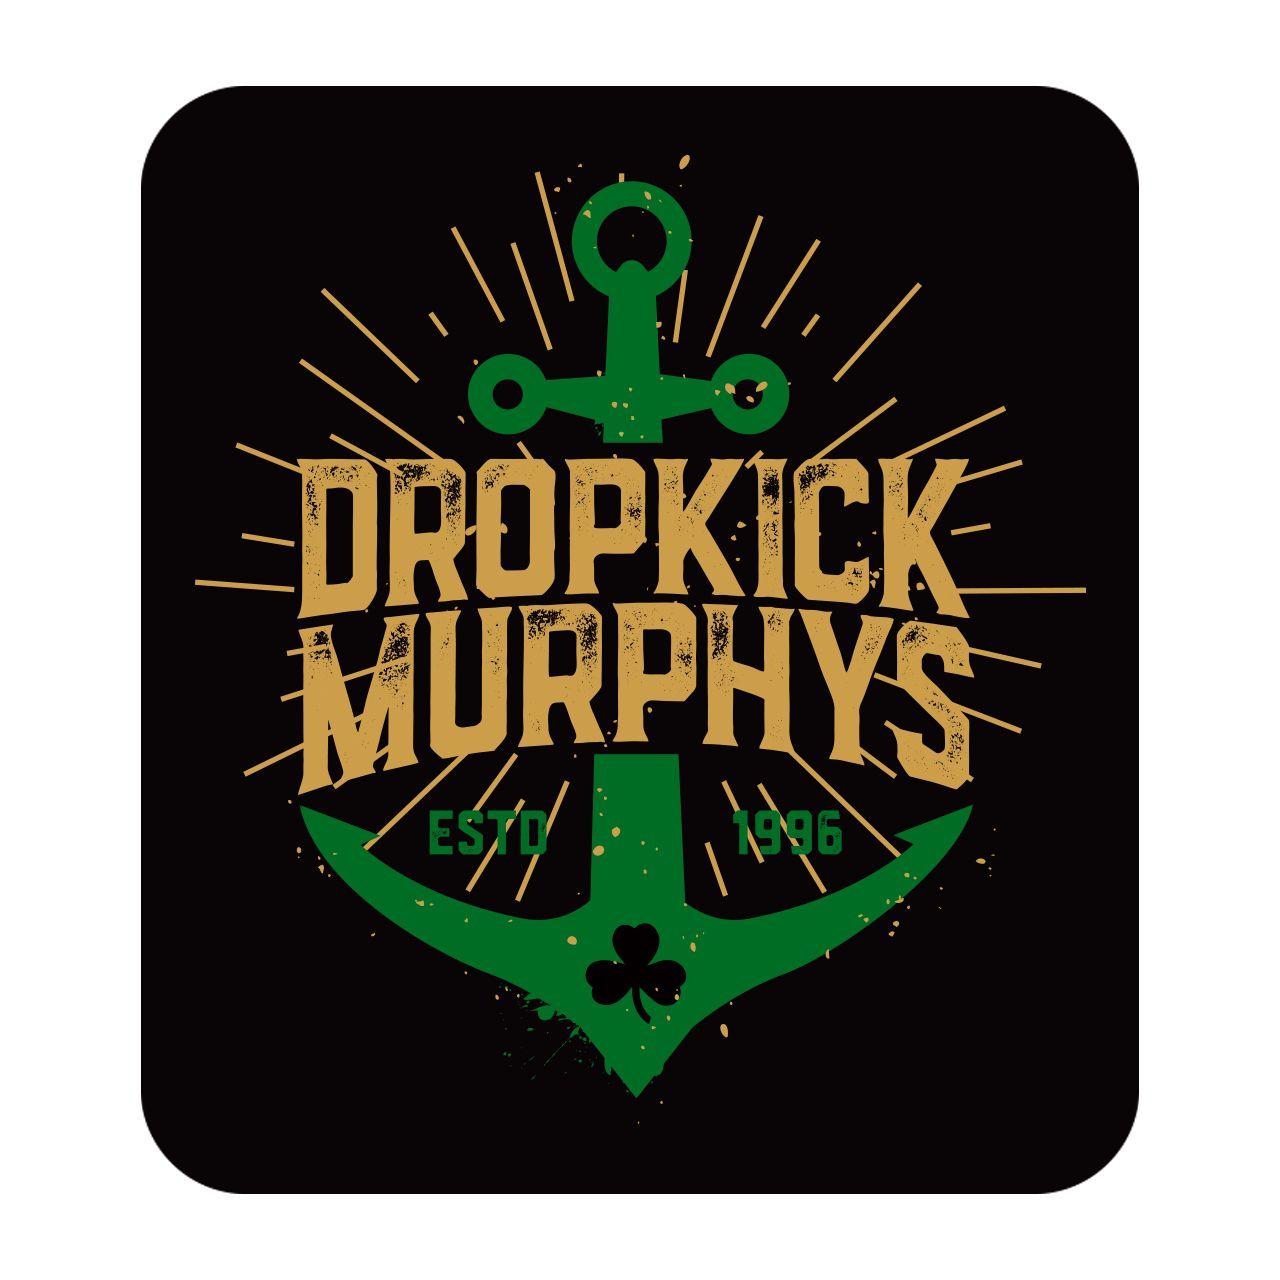 Dropkick Murphys - Anchor [Adesivo]